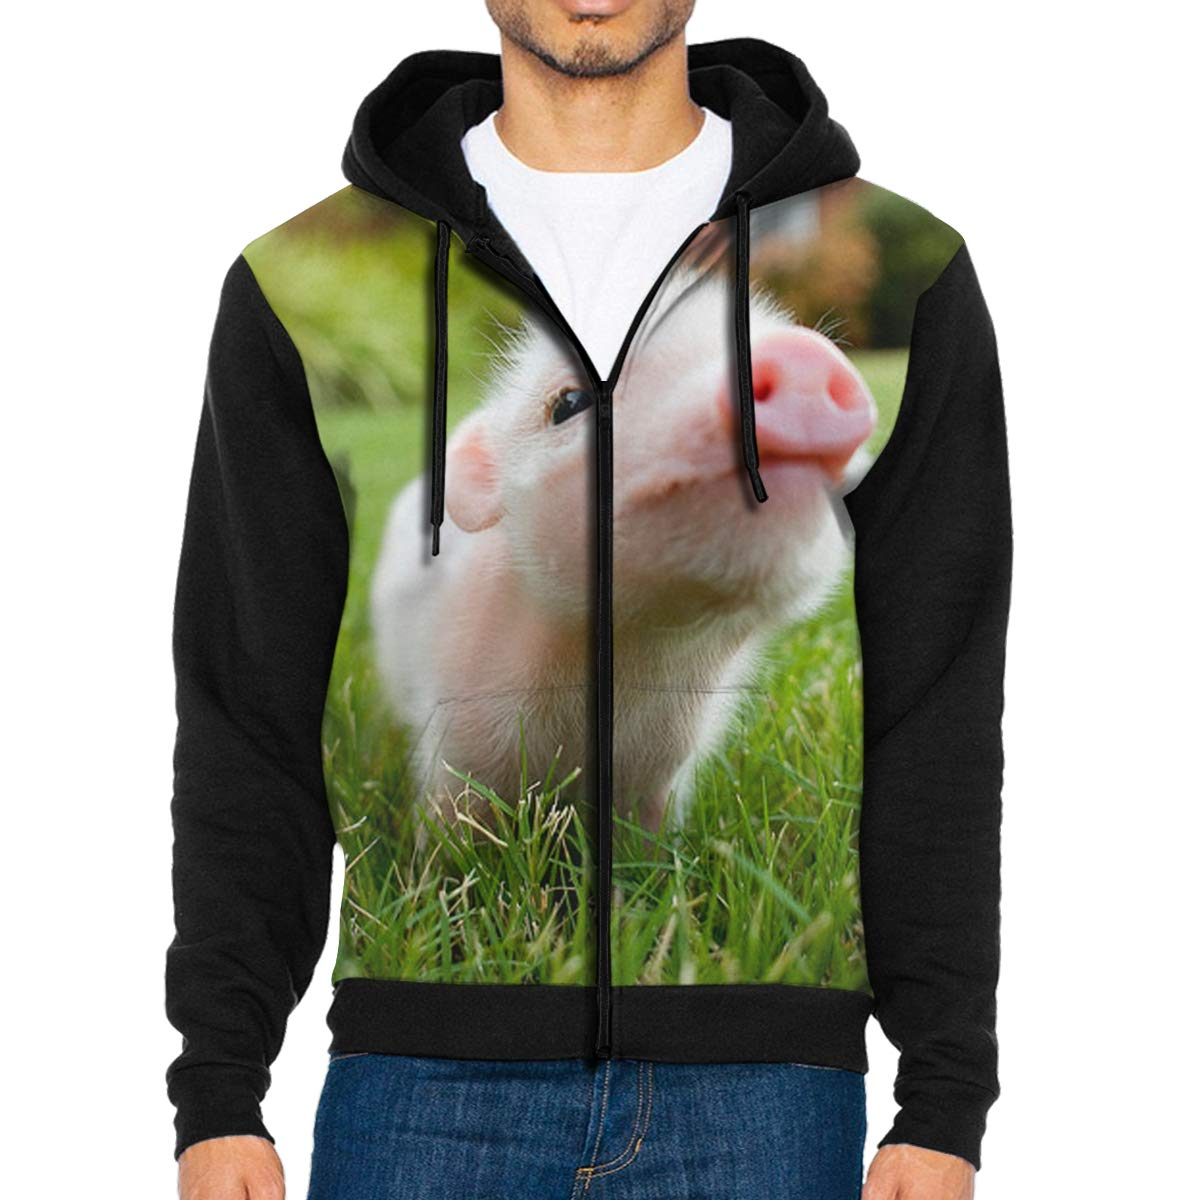 Mens Full-Zip Hoodie Sweatshirt Naughty Pig Baby Sportswear Jackets with Pockets